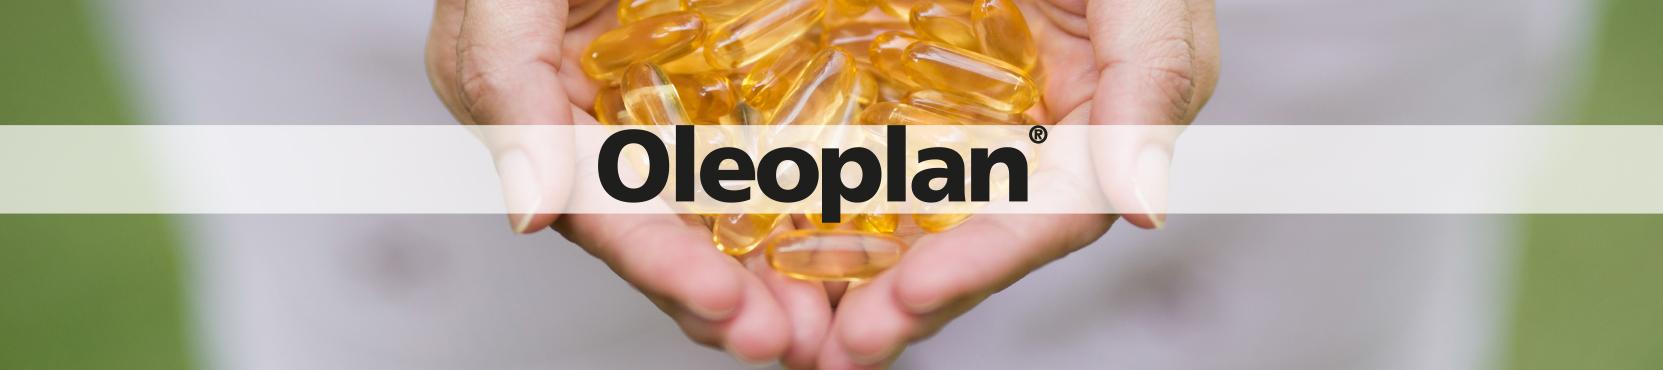 Slider Oleoplan cápsulas naturales